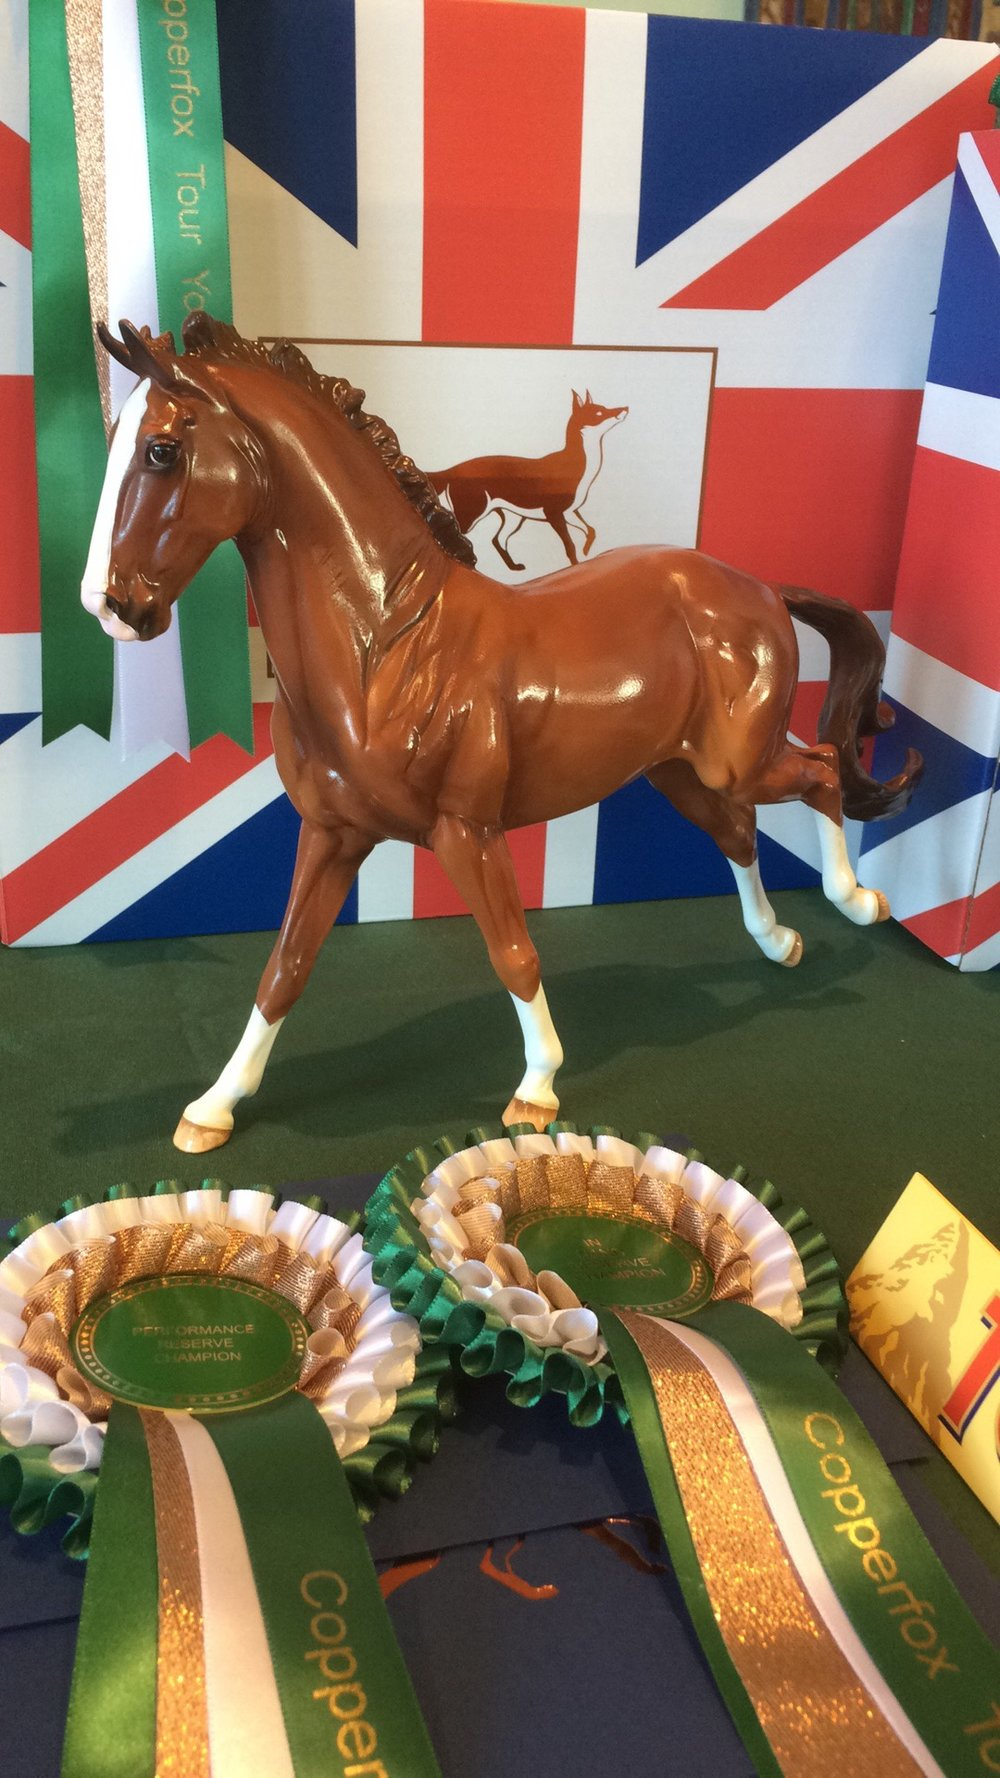 Glossy Copperfox Finnigan (Run of 16 pieces)